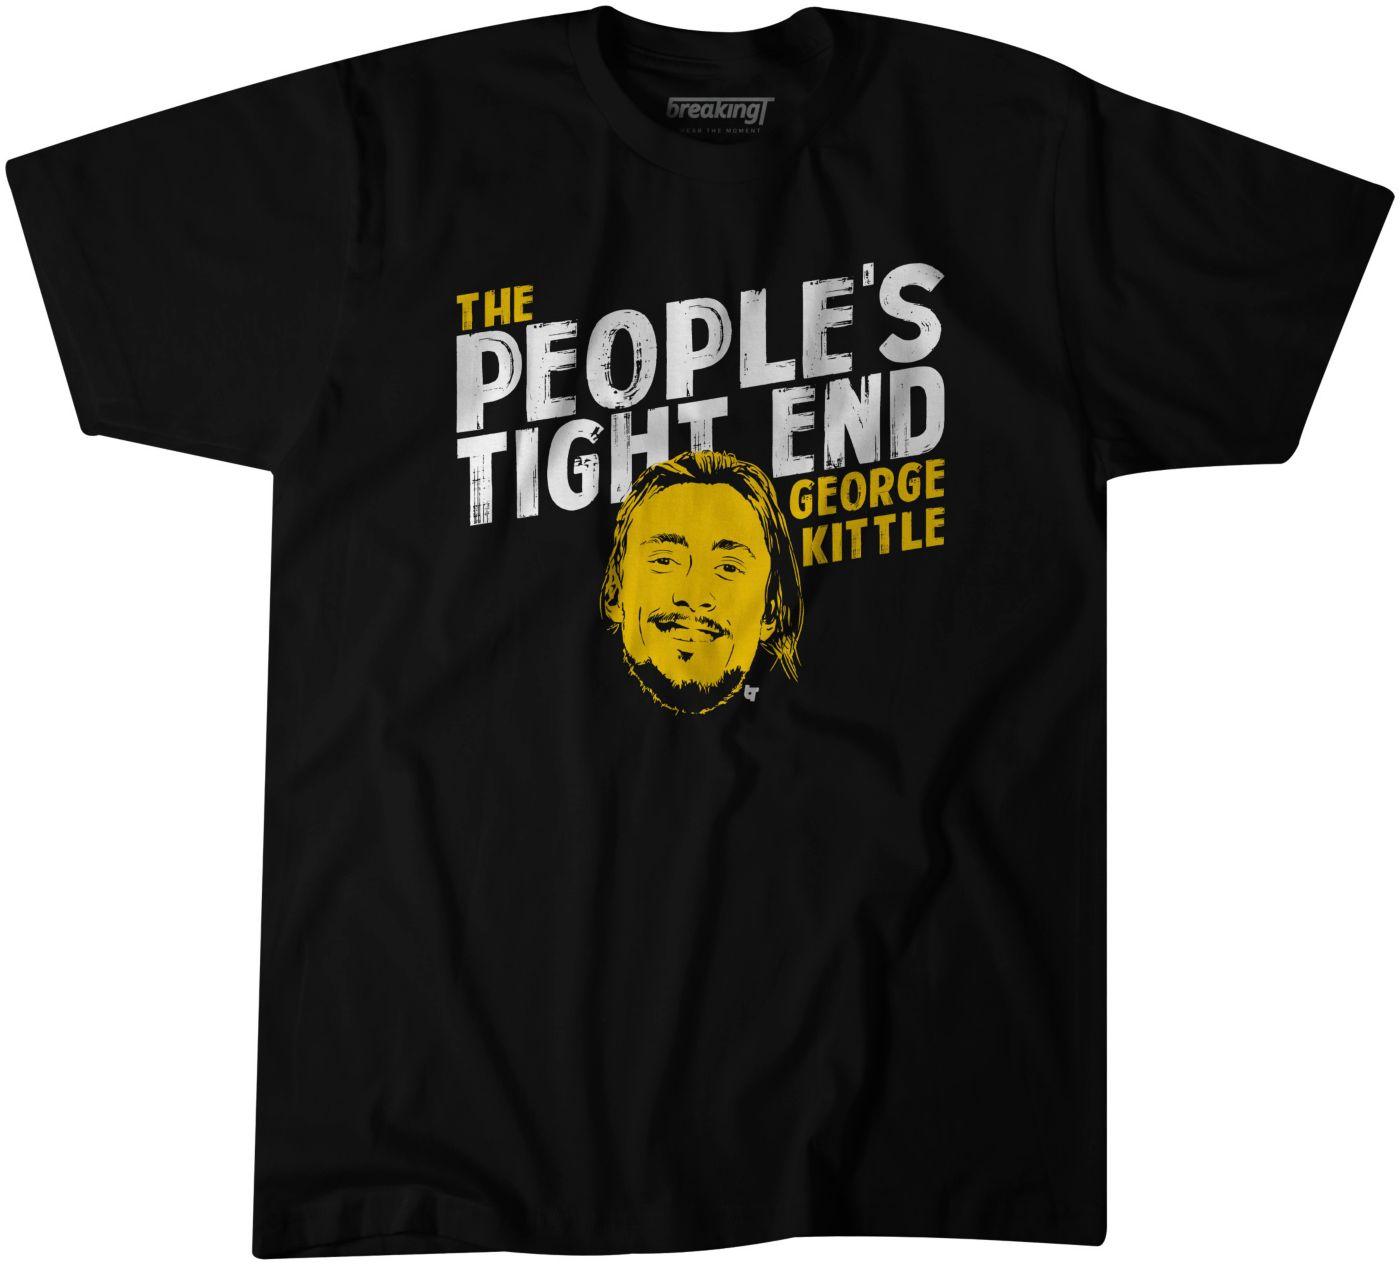 BreakingT Men's People's Tight End George Kittle Black/Gold T-Shirt